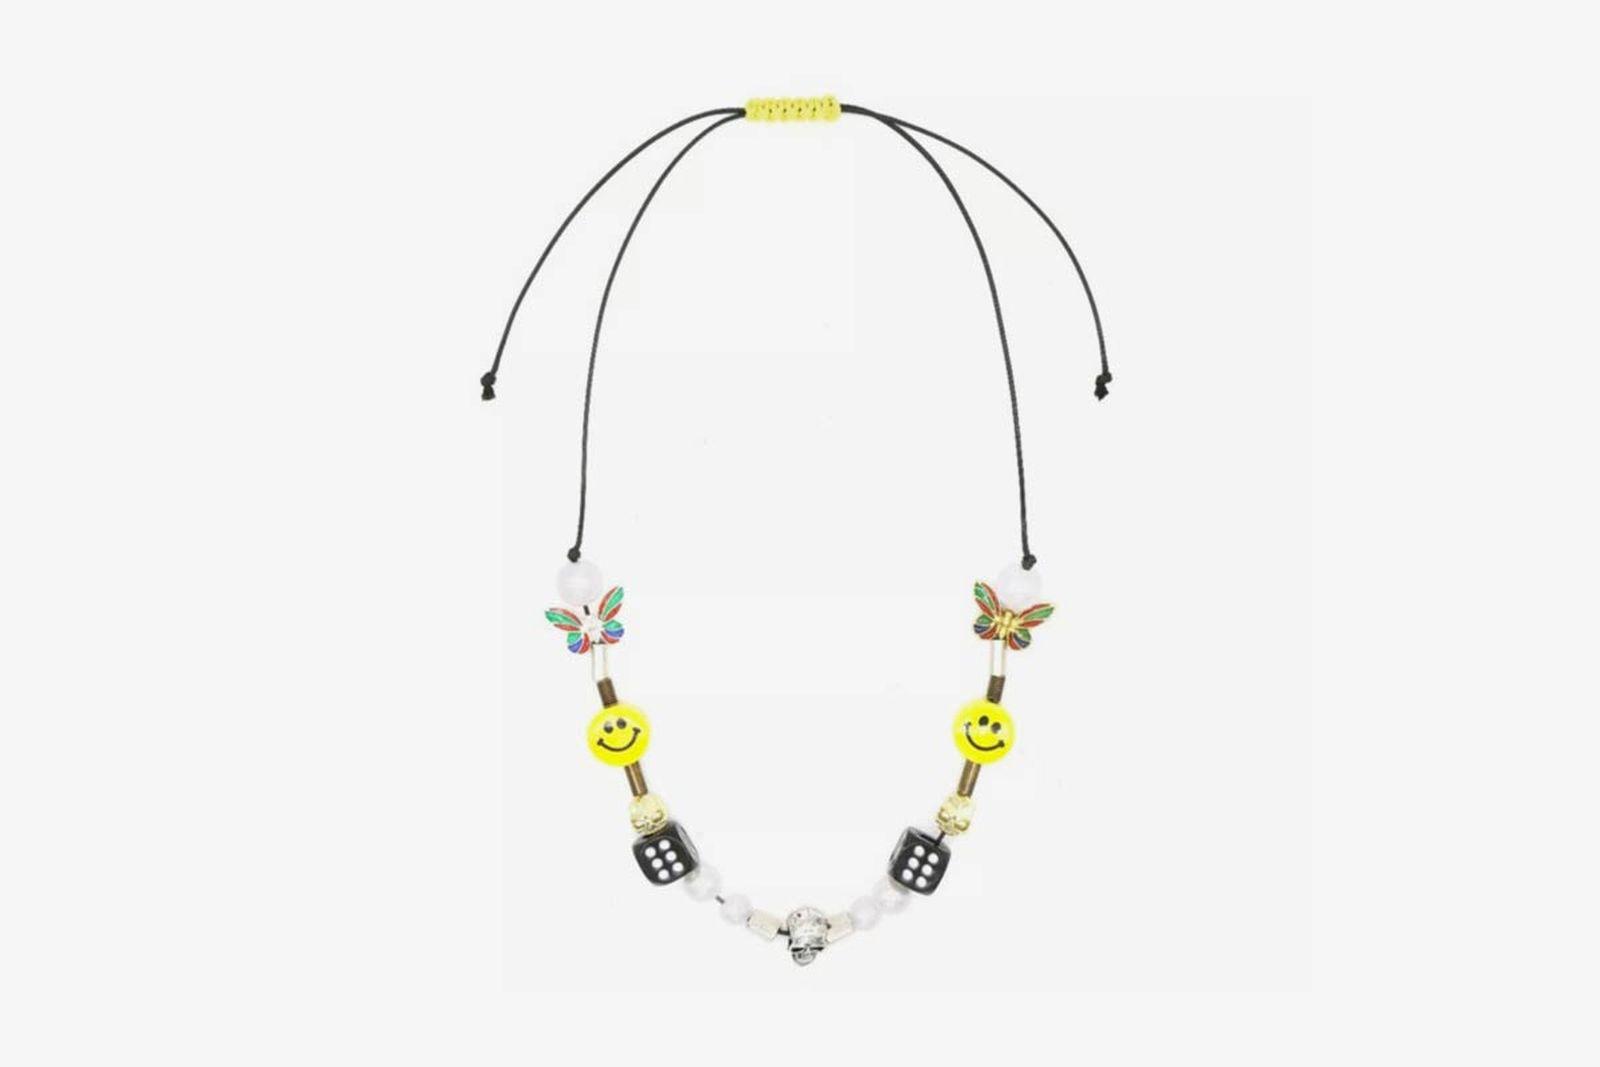 salute necklace main EJDER